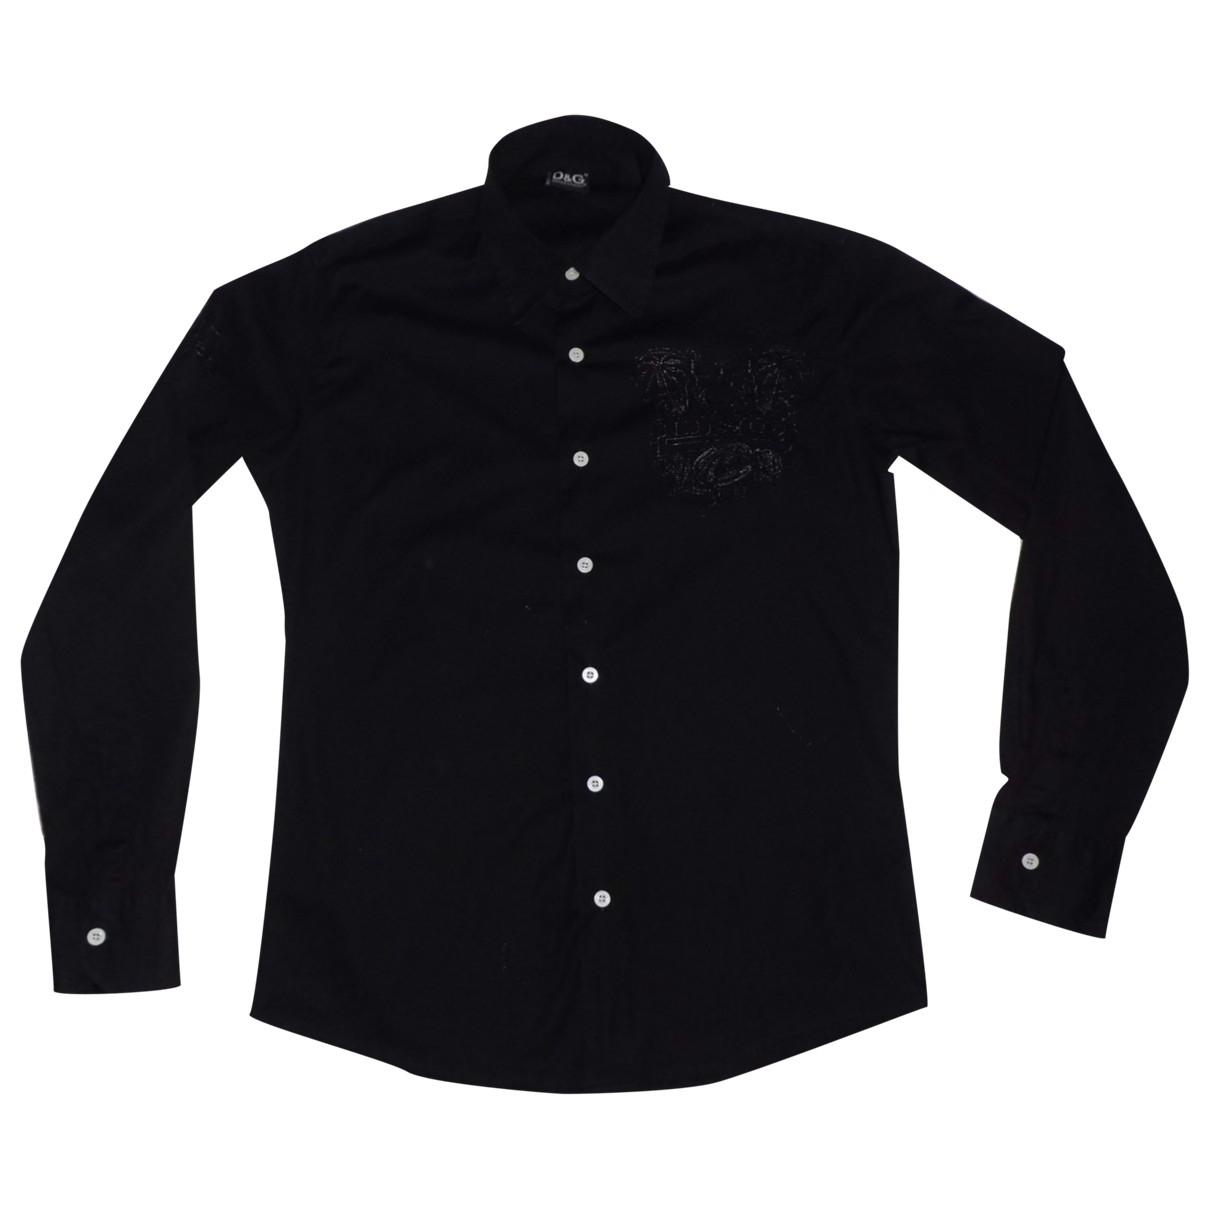 D&g \N Black Cotton Shirts for Men M International